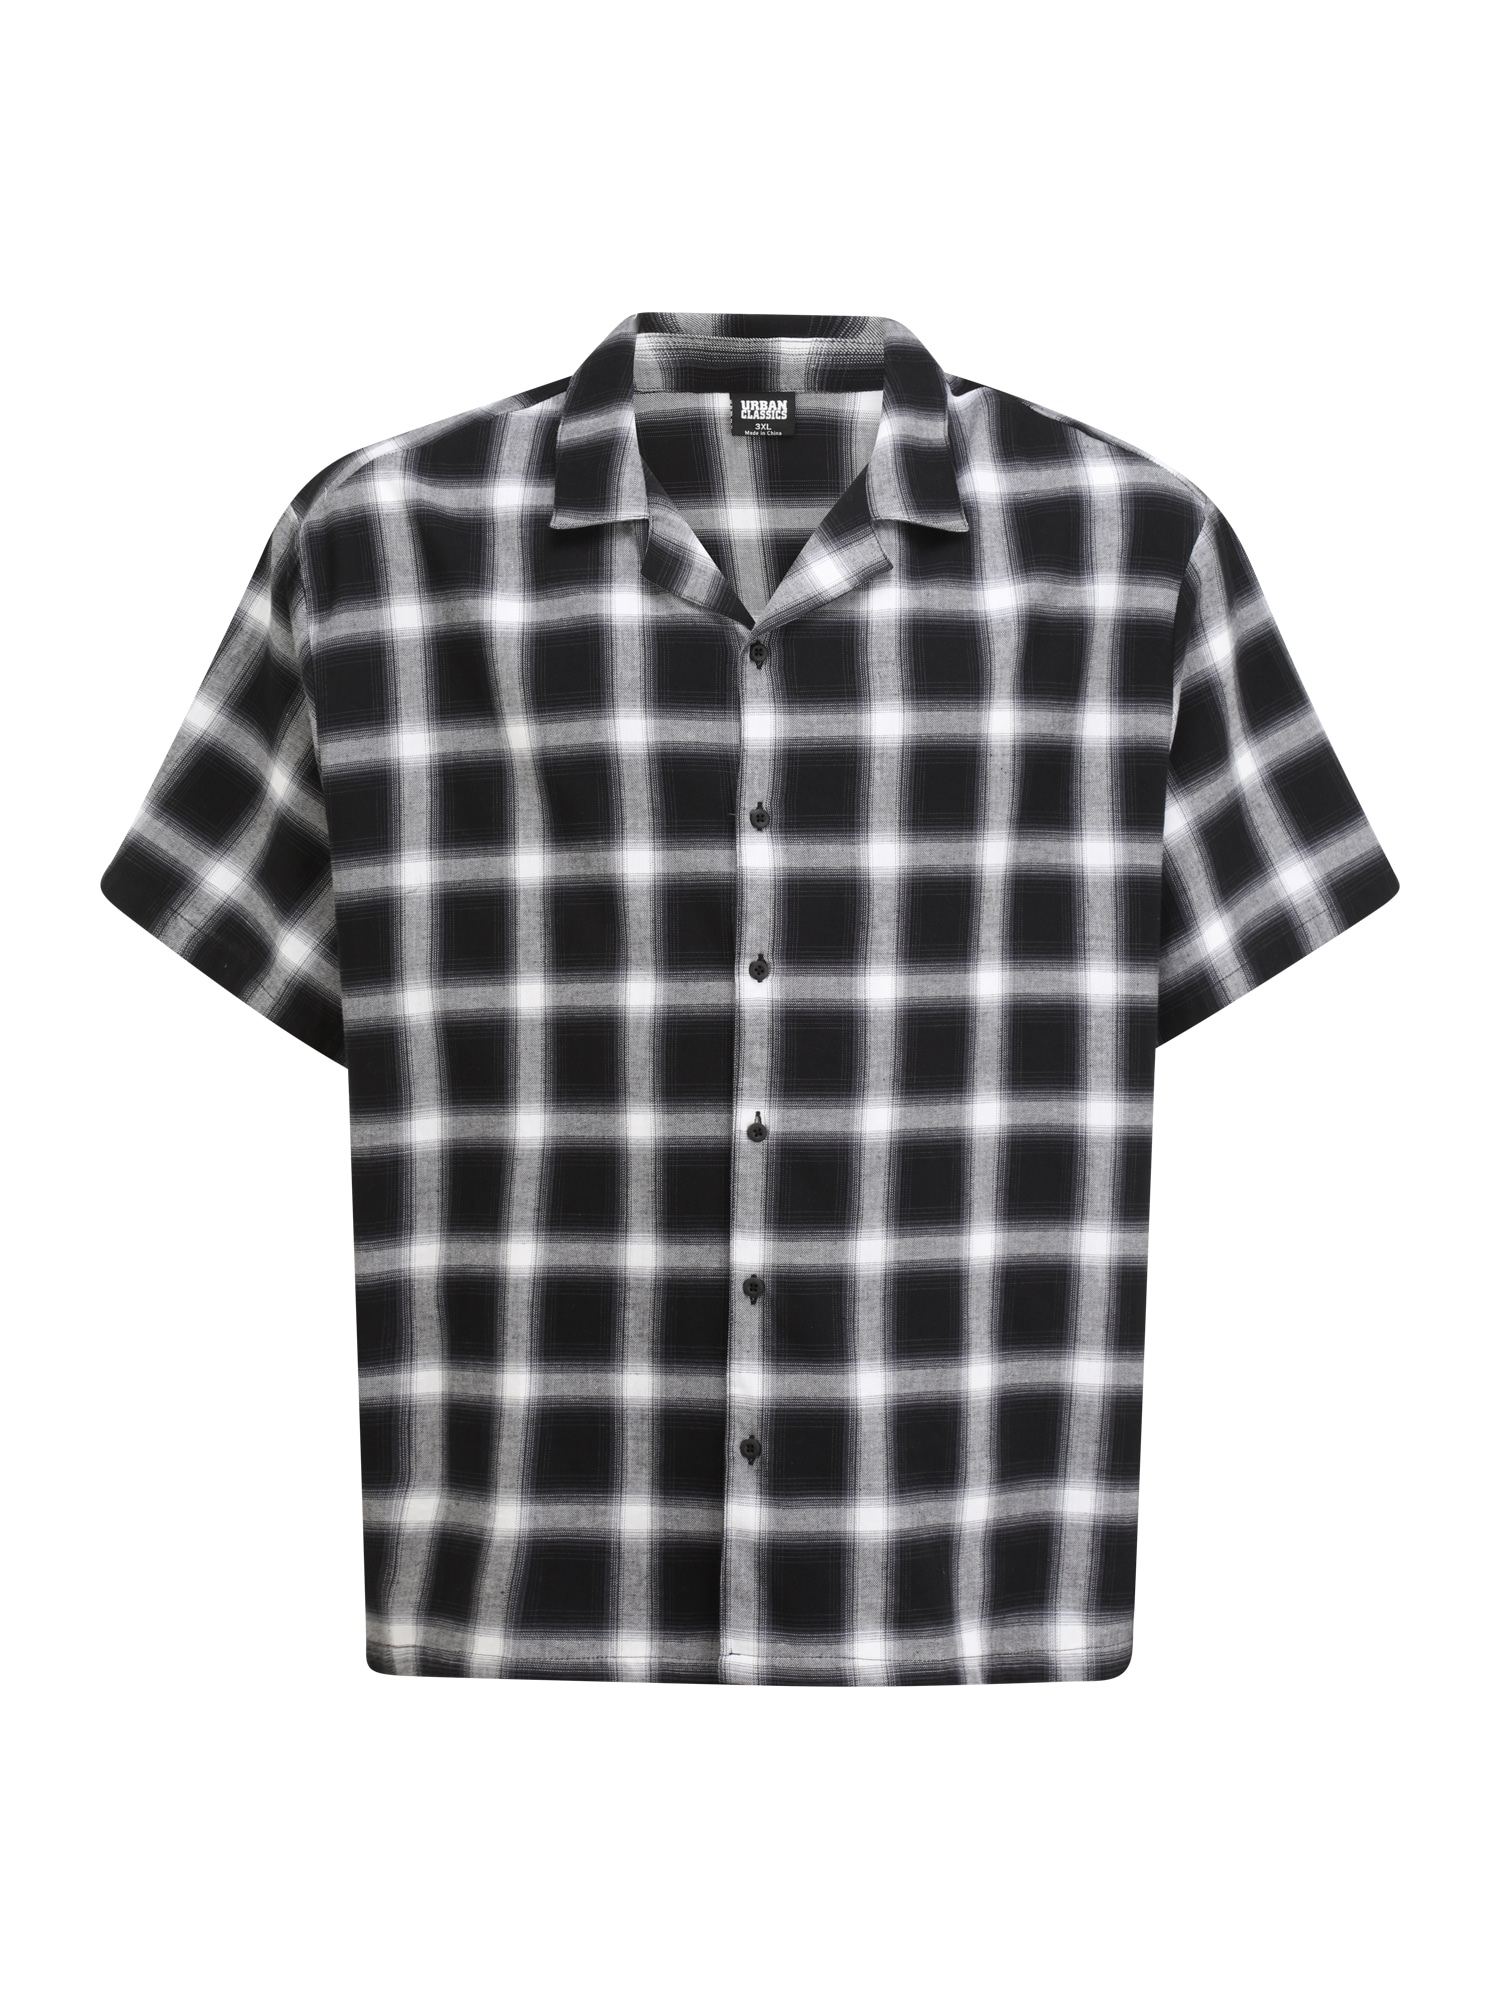 Urban Classics Plus Size Marškiniai juoda / margai pilka / balta